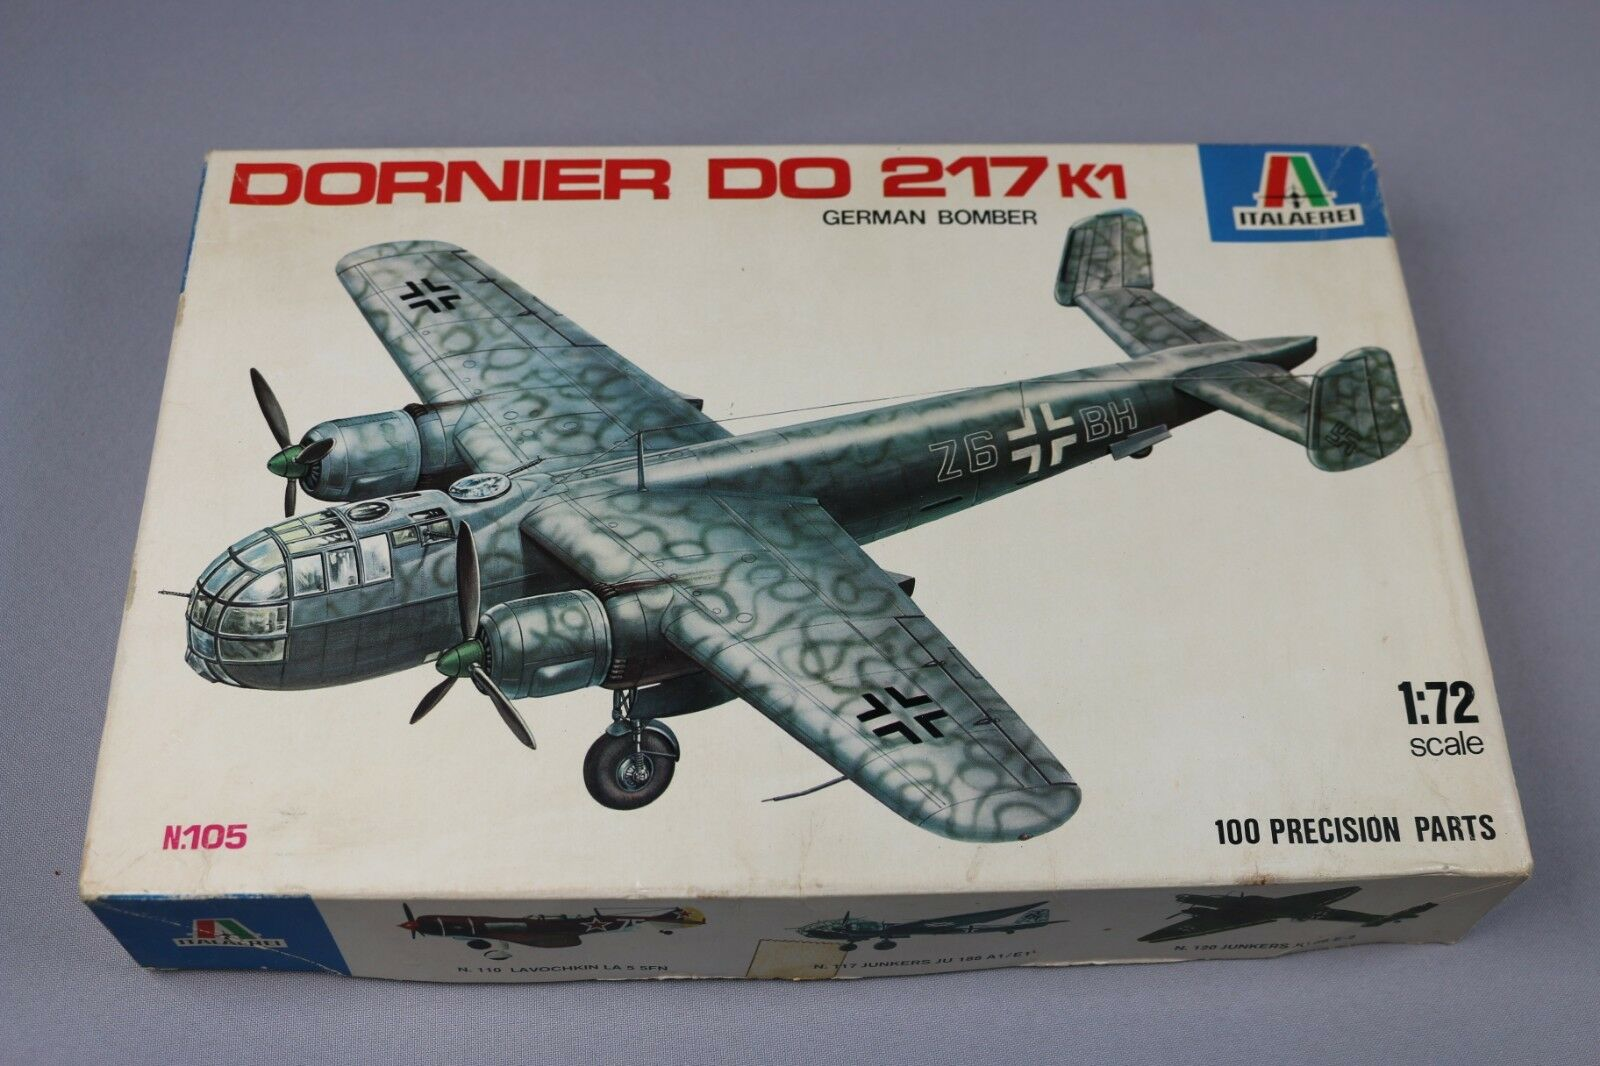 ZF441 Italeri Italaerei 1 72 maquette avion N.105 N.105 N.105 DORNIER DO 217 K1 german bombe a98e79